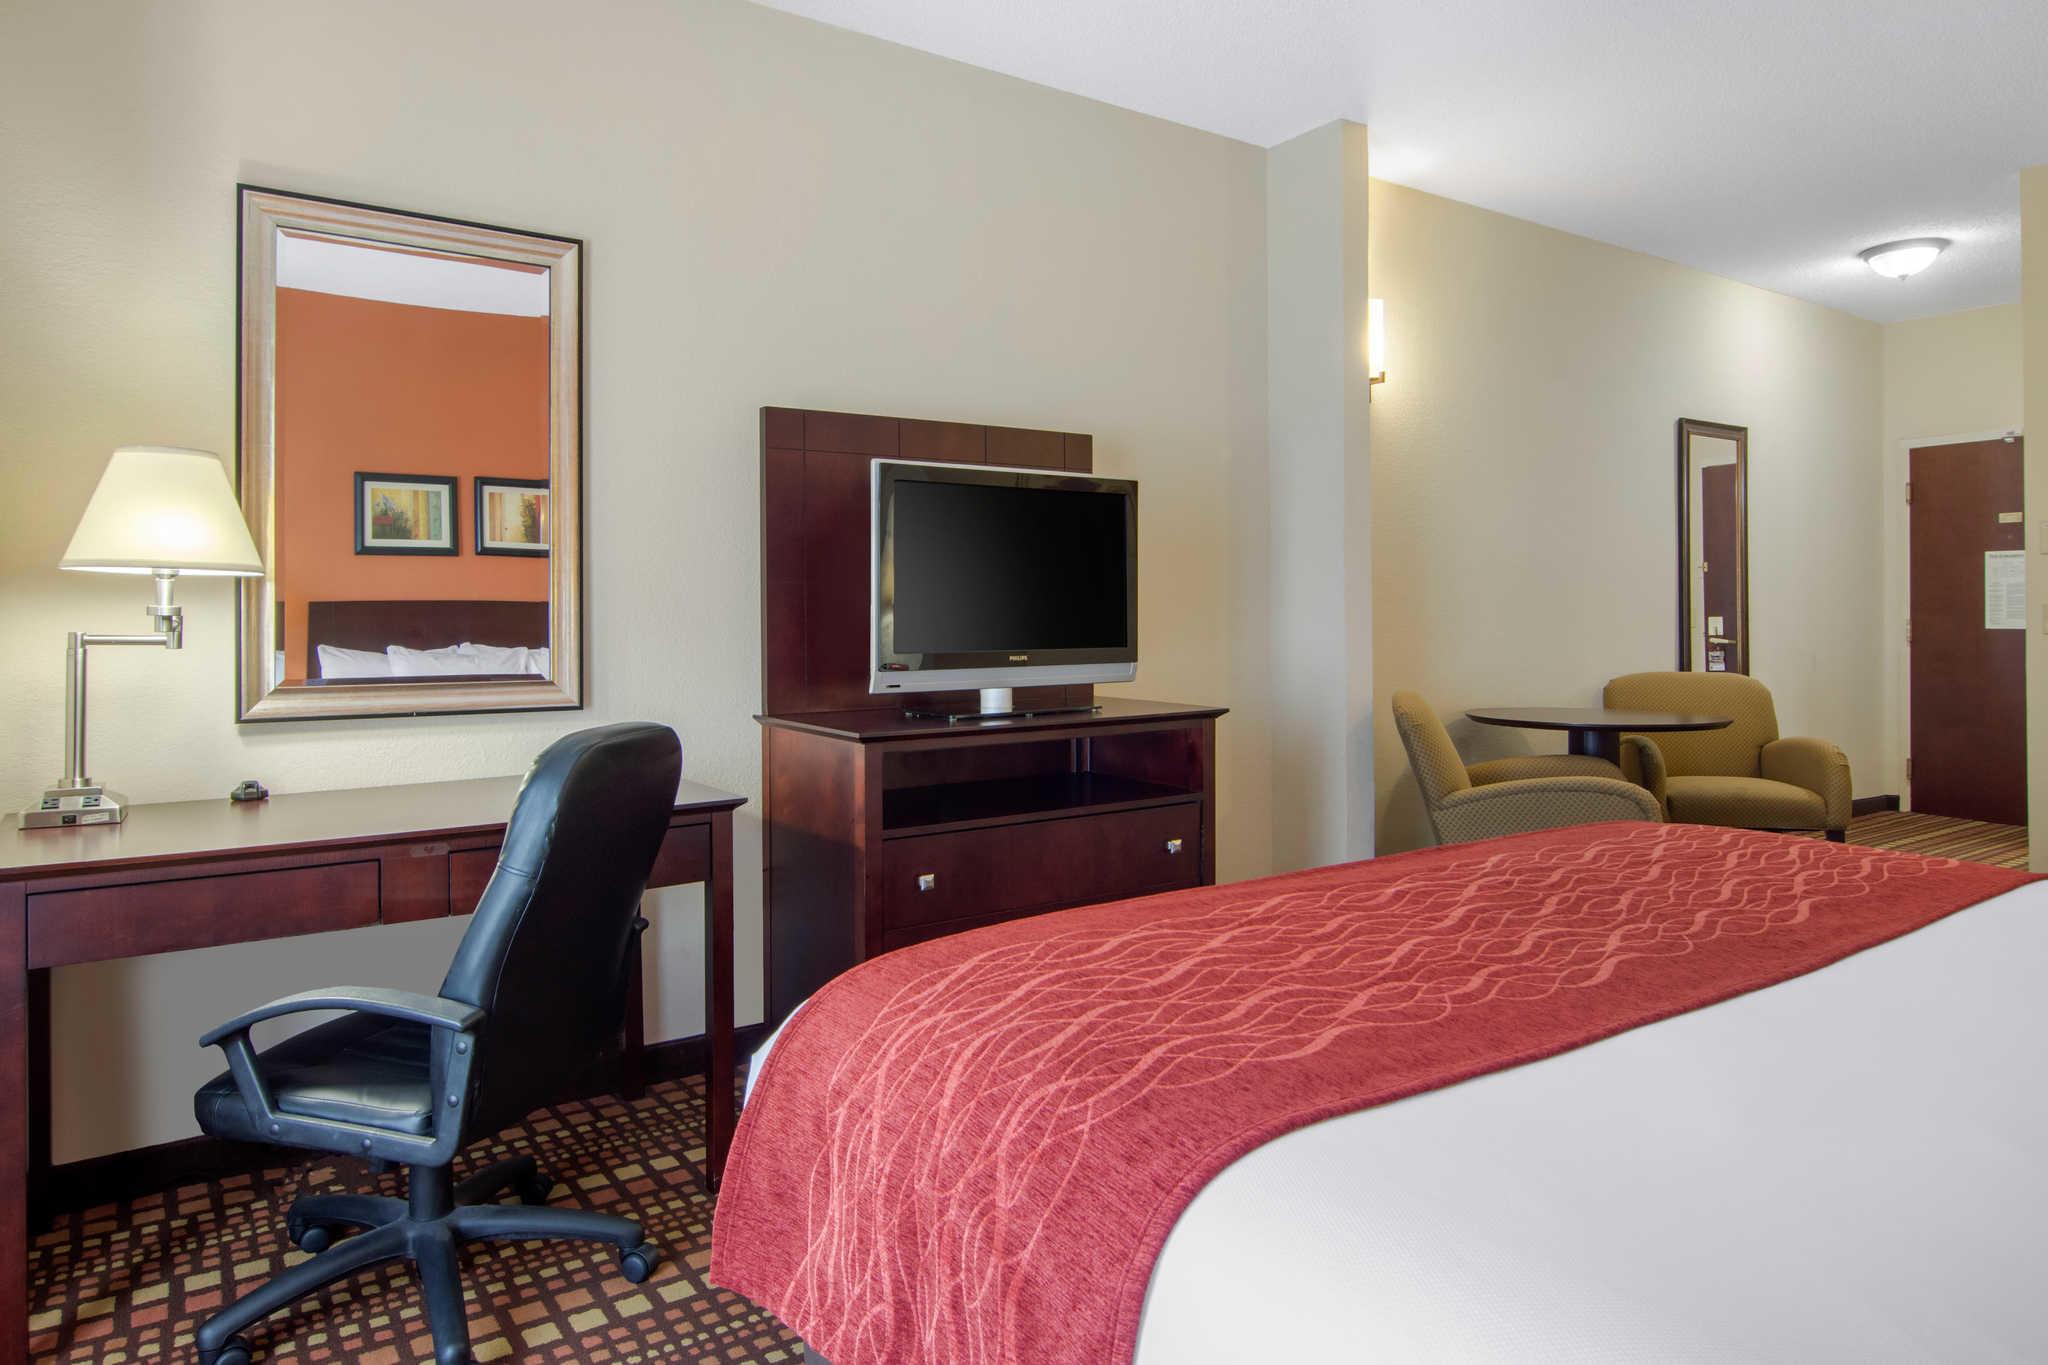 Comfort Inn & Suites image 14